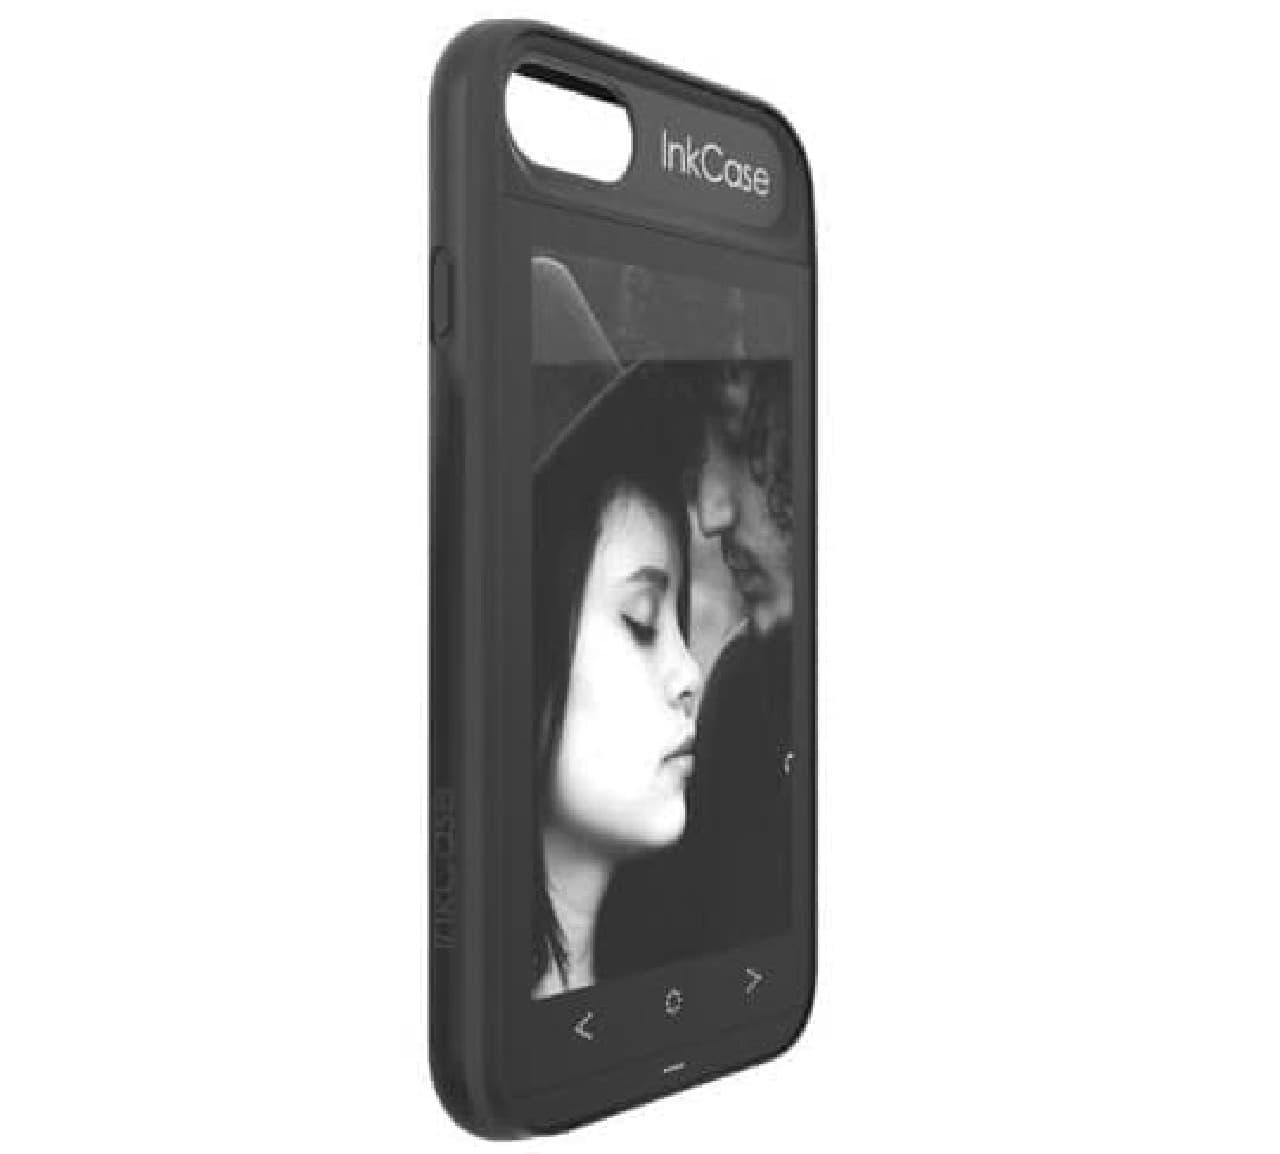 iPhone 7を電子書籍リーダーにするスマホケース「Oaxis InkCase i7」